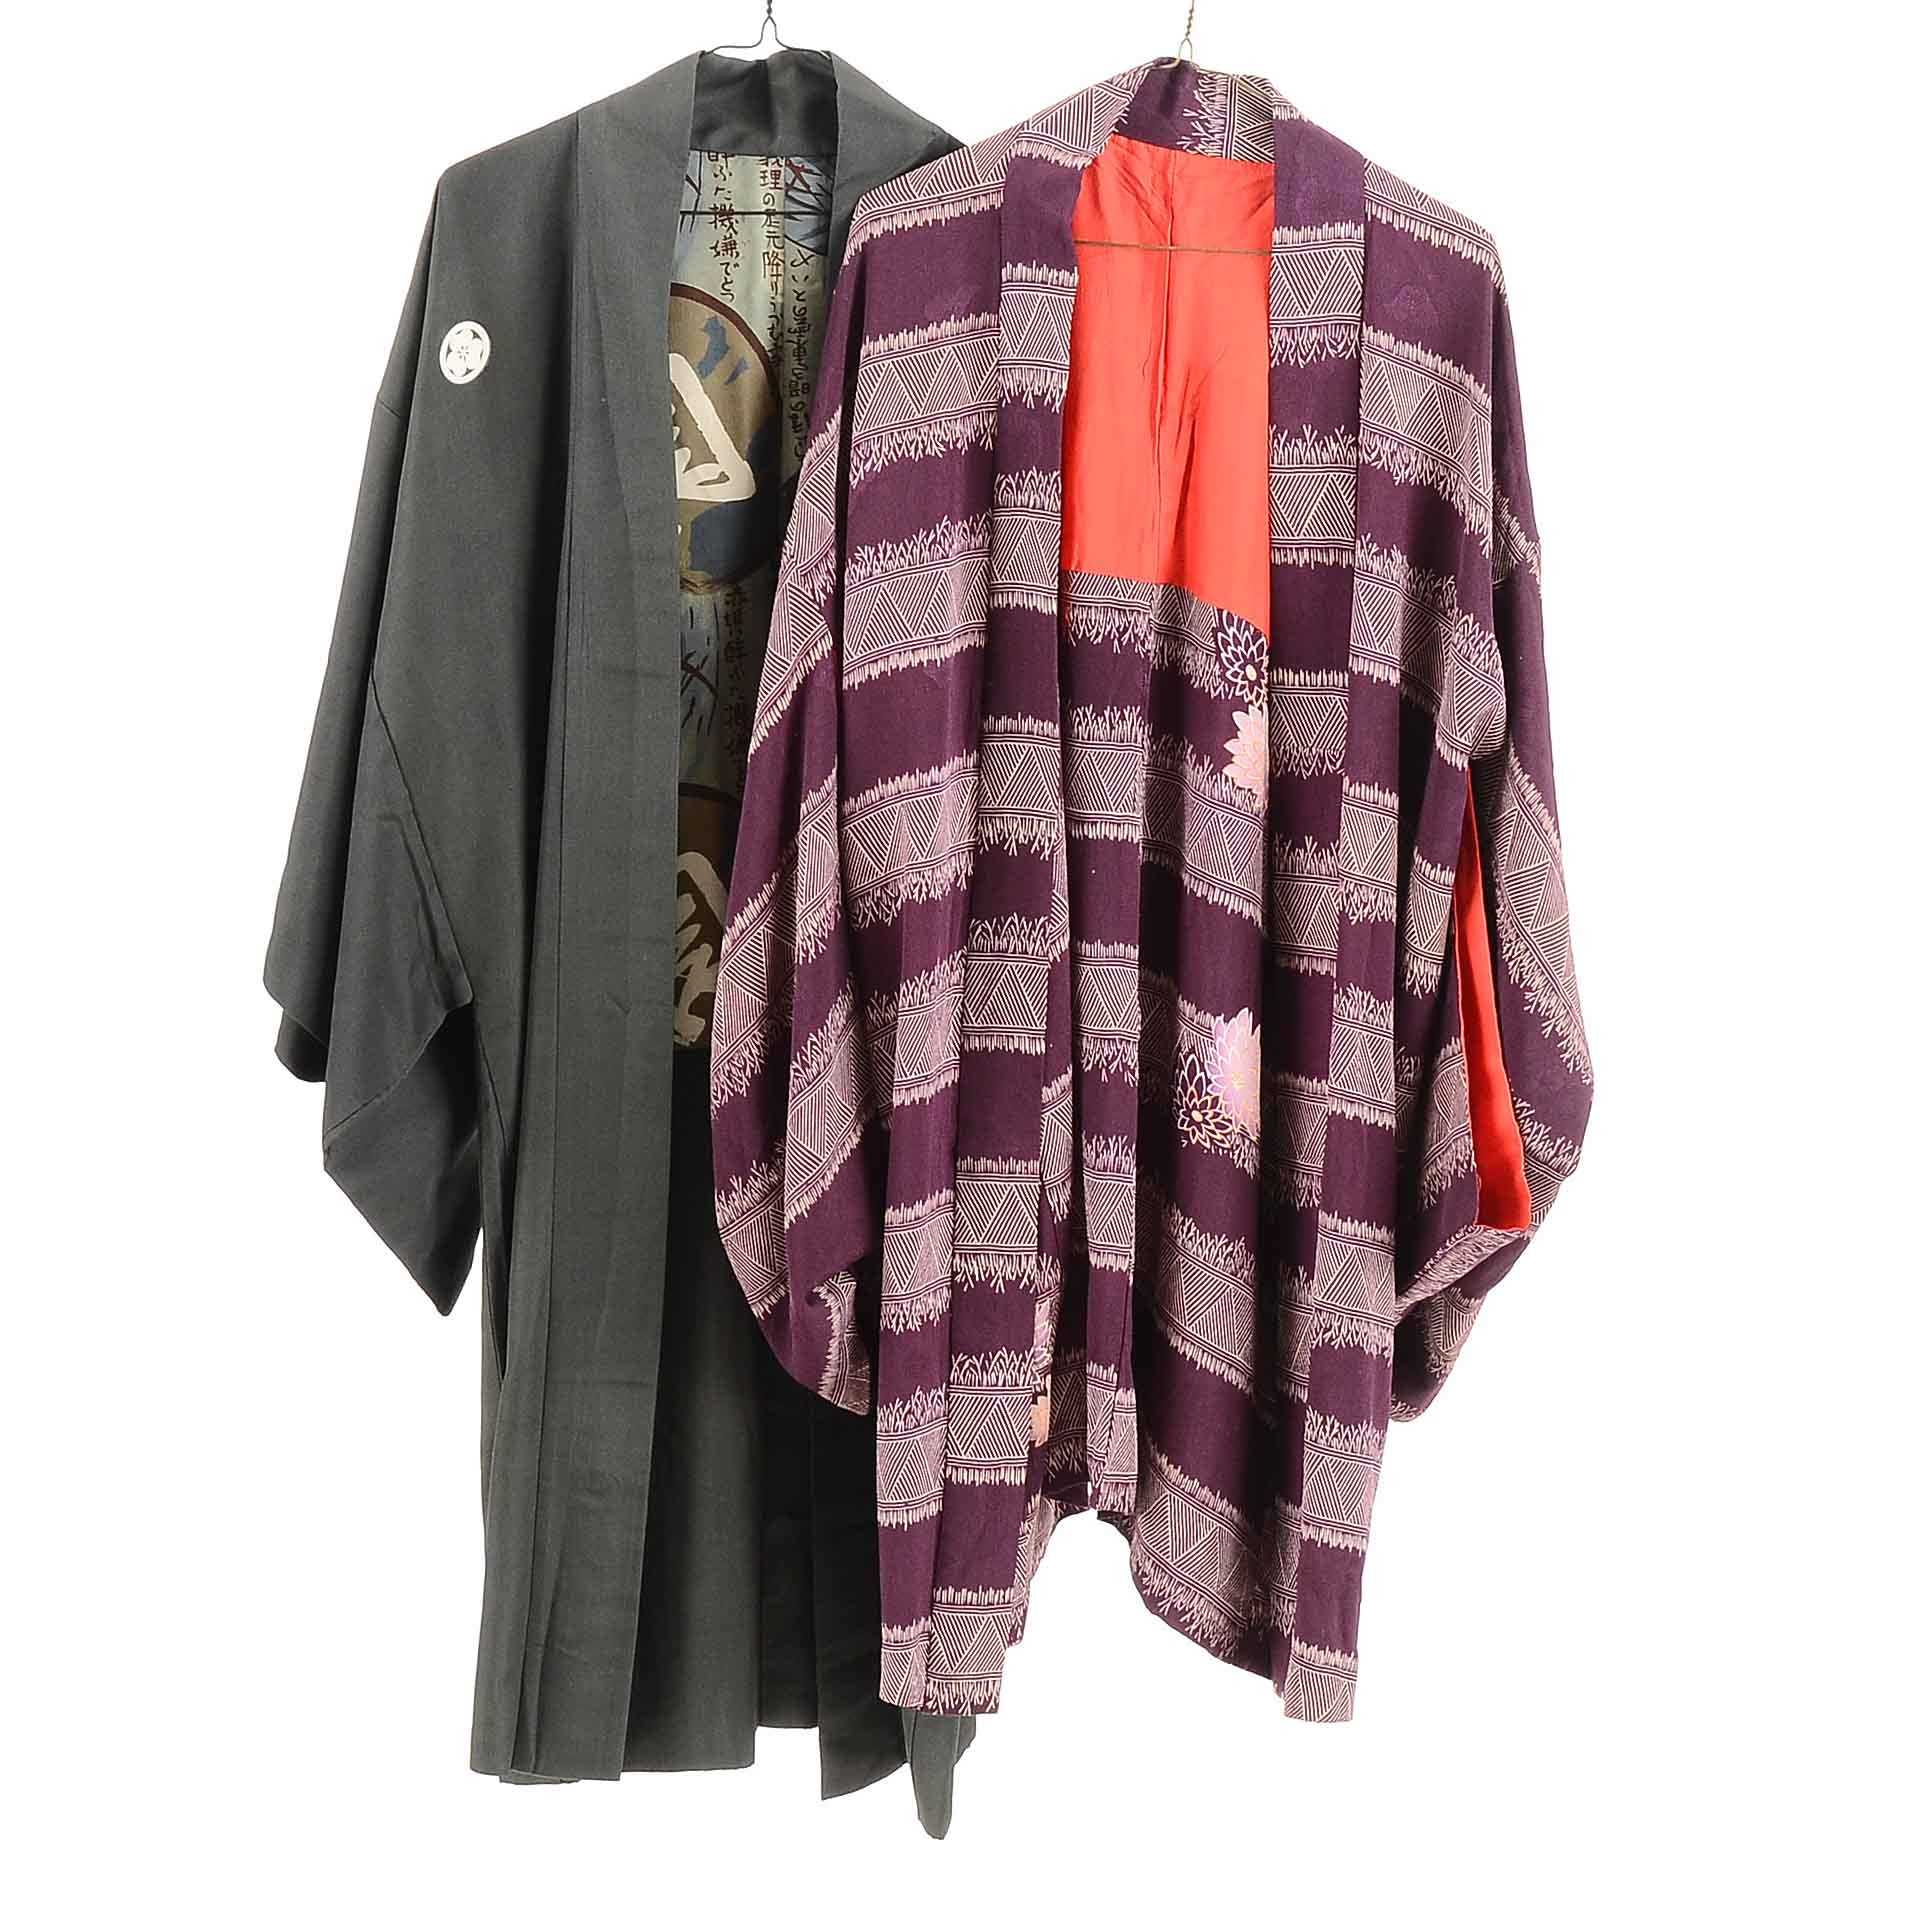 Vintage Japanese Silk Haori Jackets